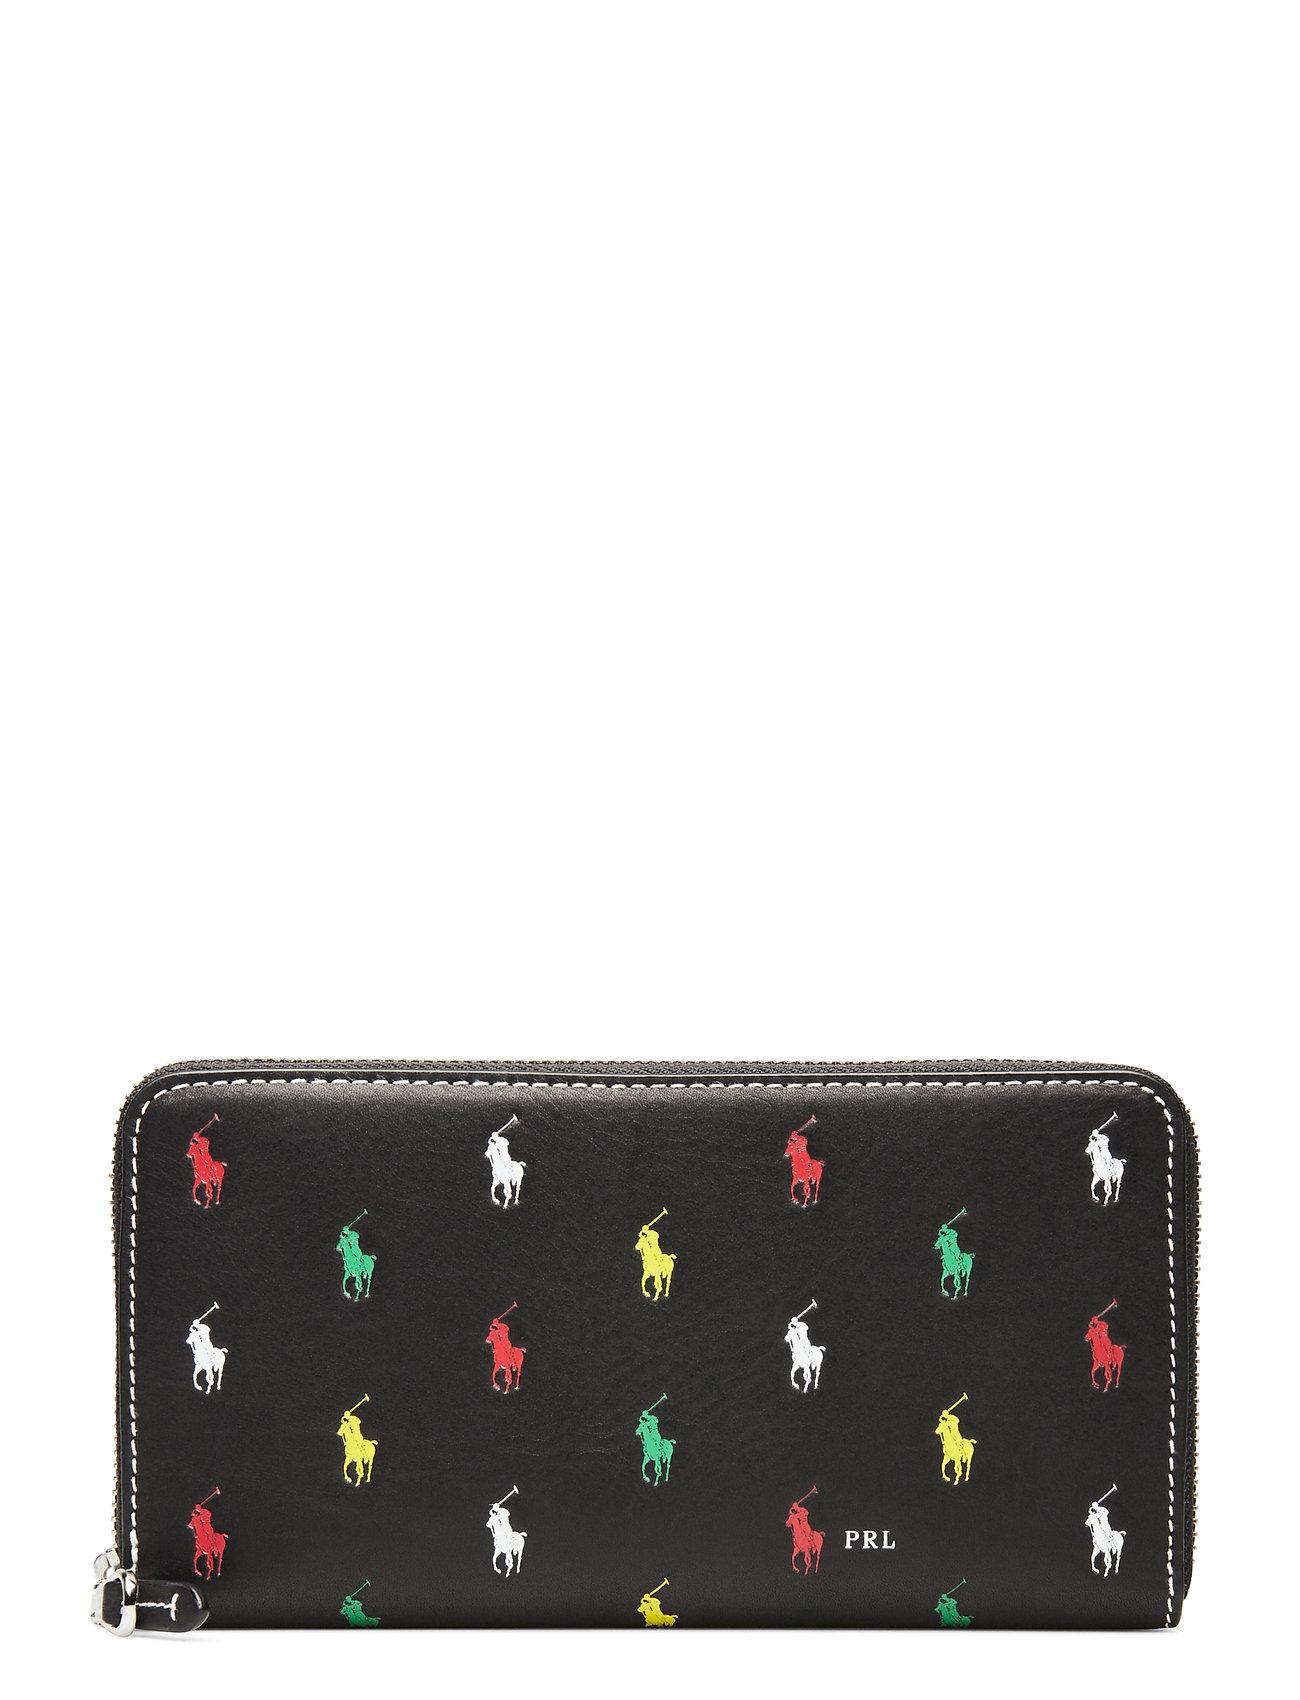 Polo Ralph Lauren Pony Leather Zip Wallet - BLACK MULTI